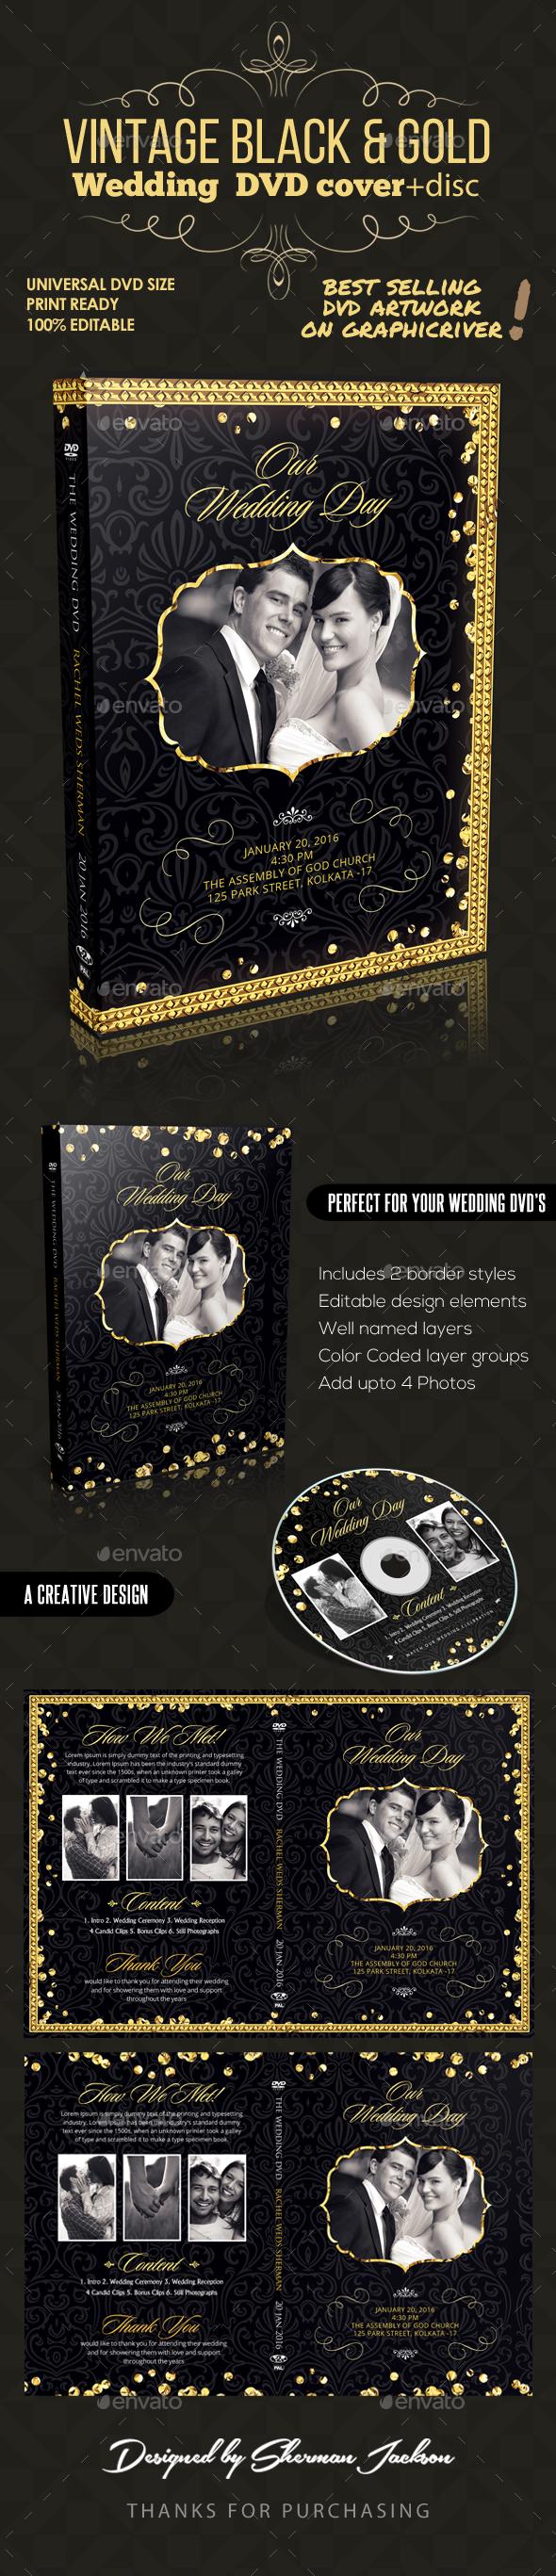 Vintage Black & Gold Wedding DVD Template - CD & DVD Artwork Print Templates